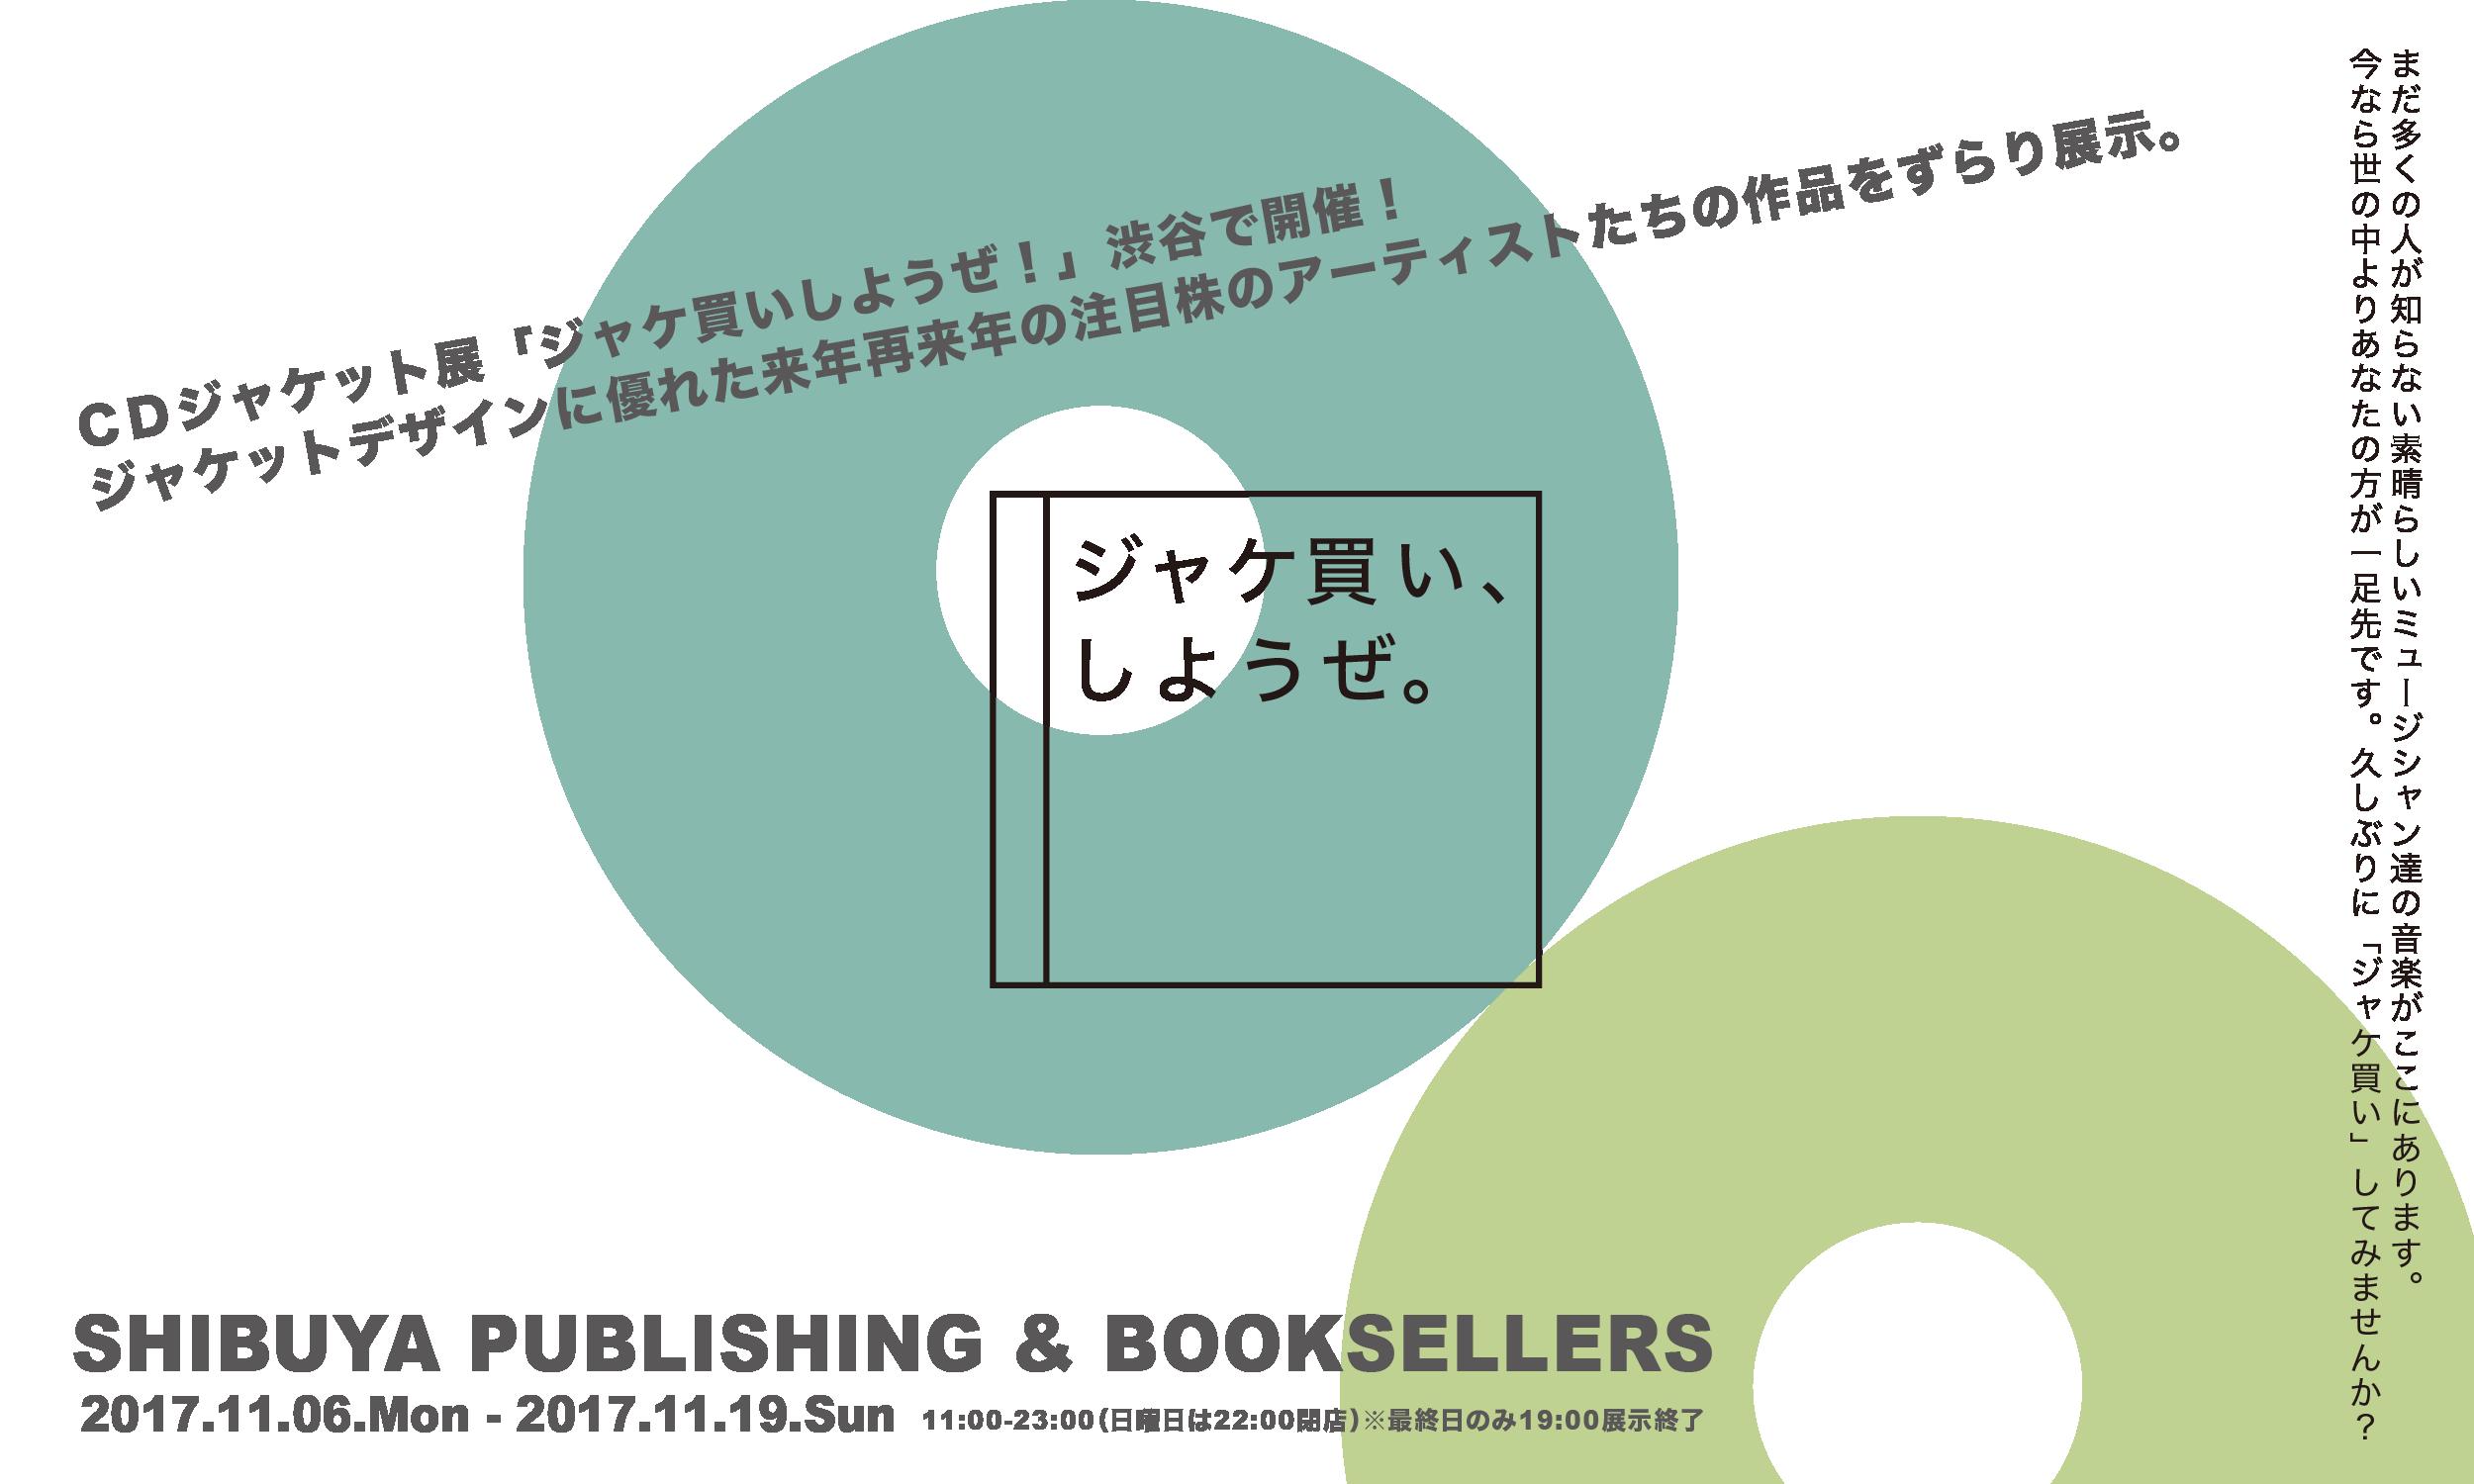 【NEWS】CDジャケット展『ジャケ買いしようぜ!』にCUBERS出展!